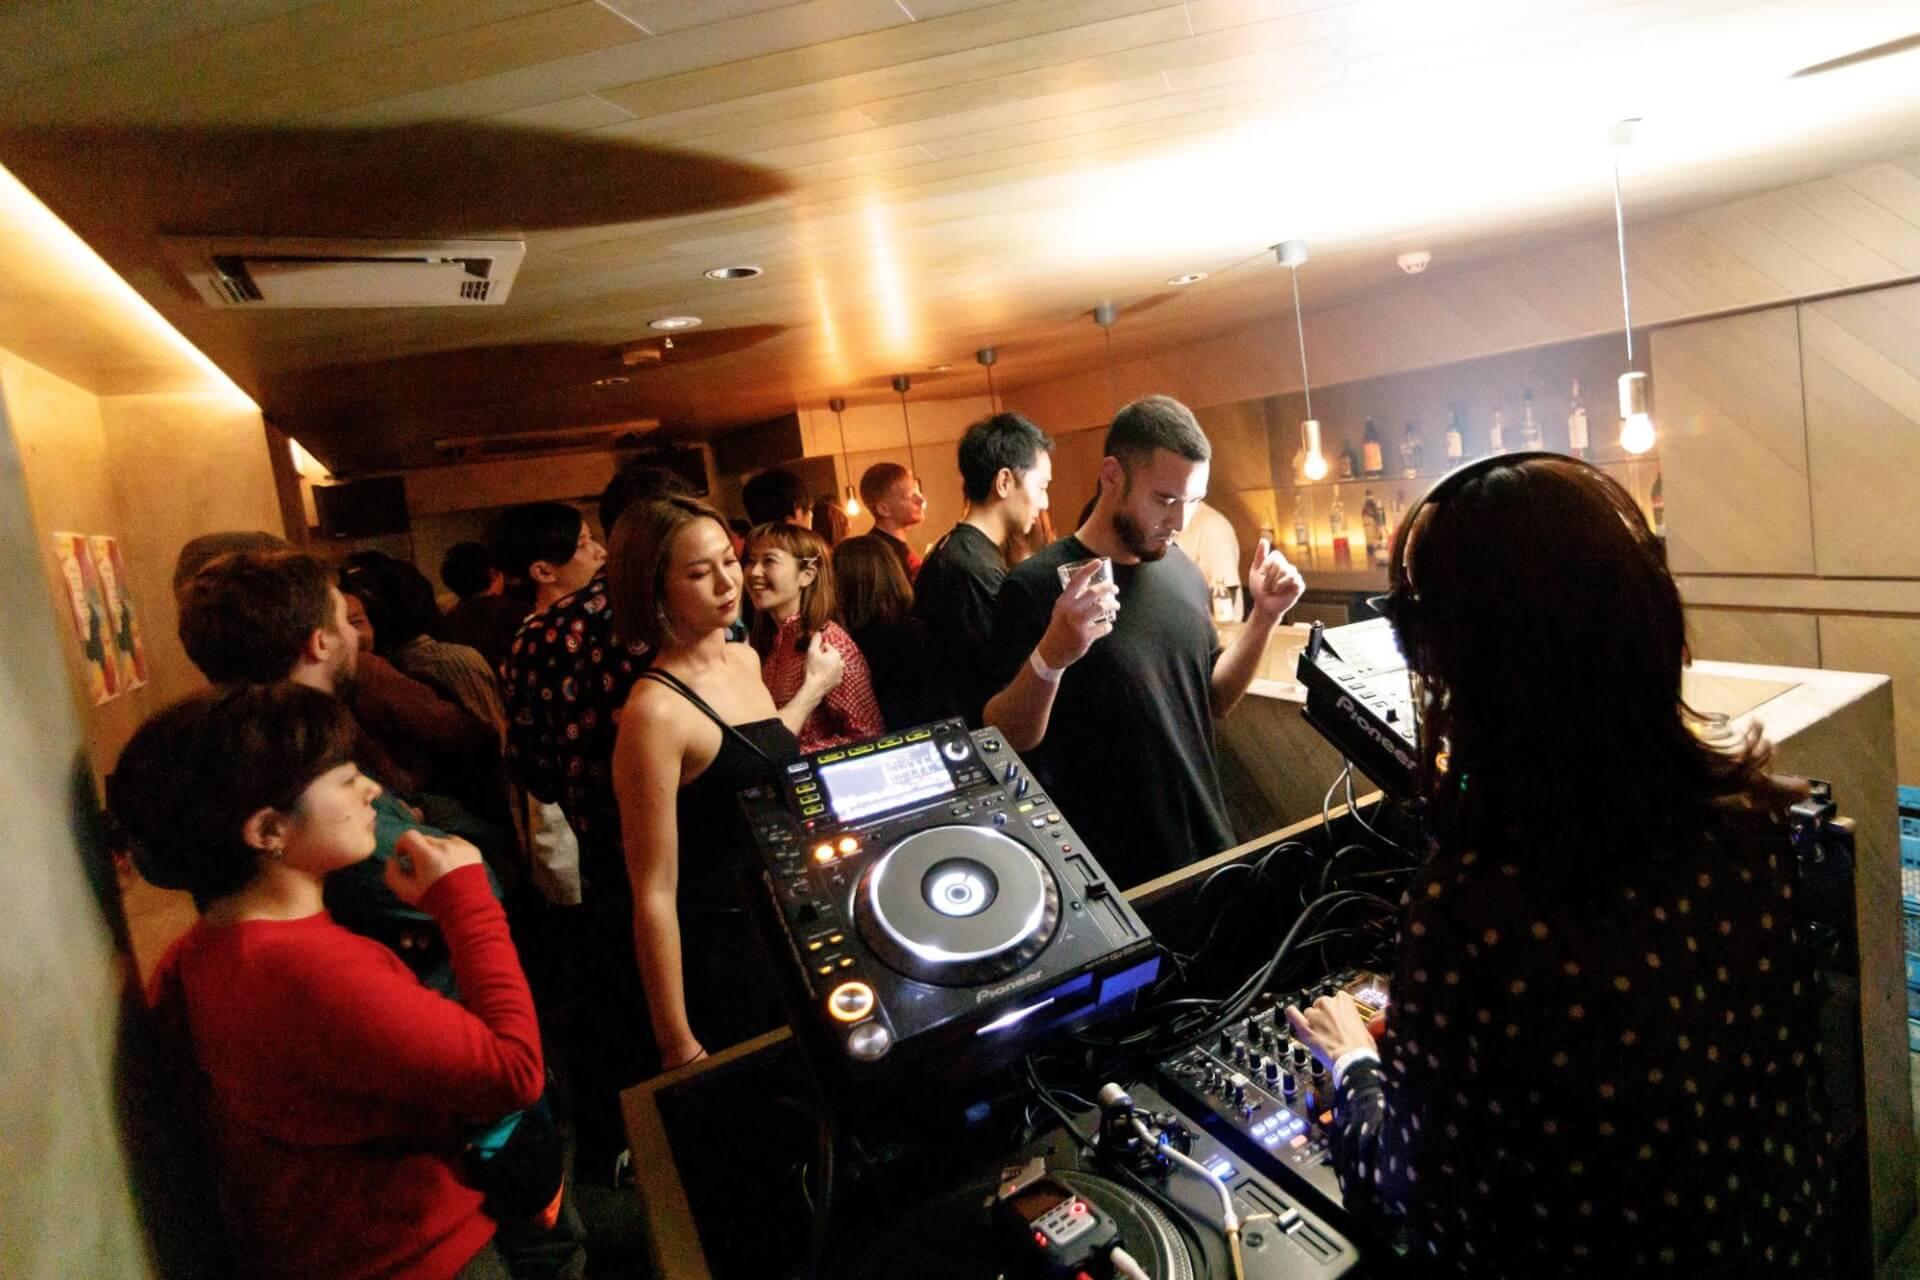 Floating Points at KEWL 2nd Anniversary Party。ダンスミュージックへの初期衝動を想い返した夜 music200116-kewl-floating-points-5